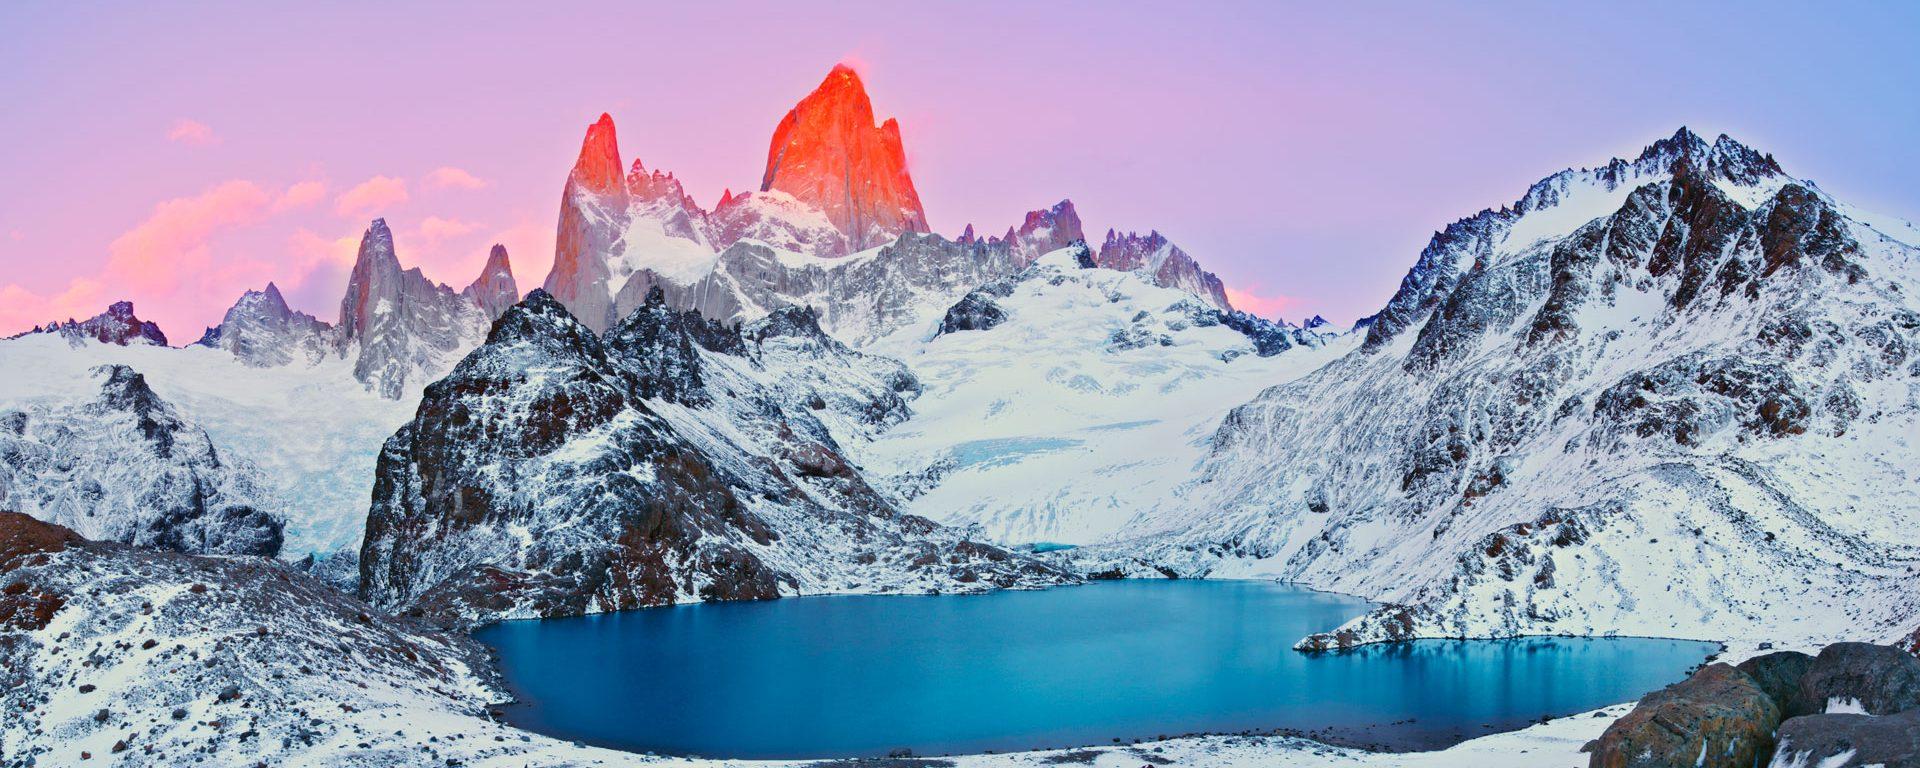 Sunrise on Mount Fitz Roy and Laguna de los Tres, Los Glaciares National Park, Patagonia, Argentina